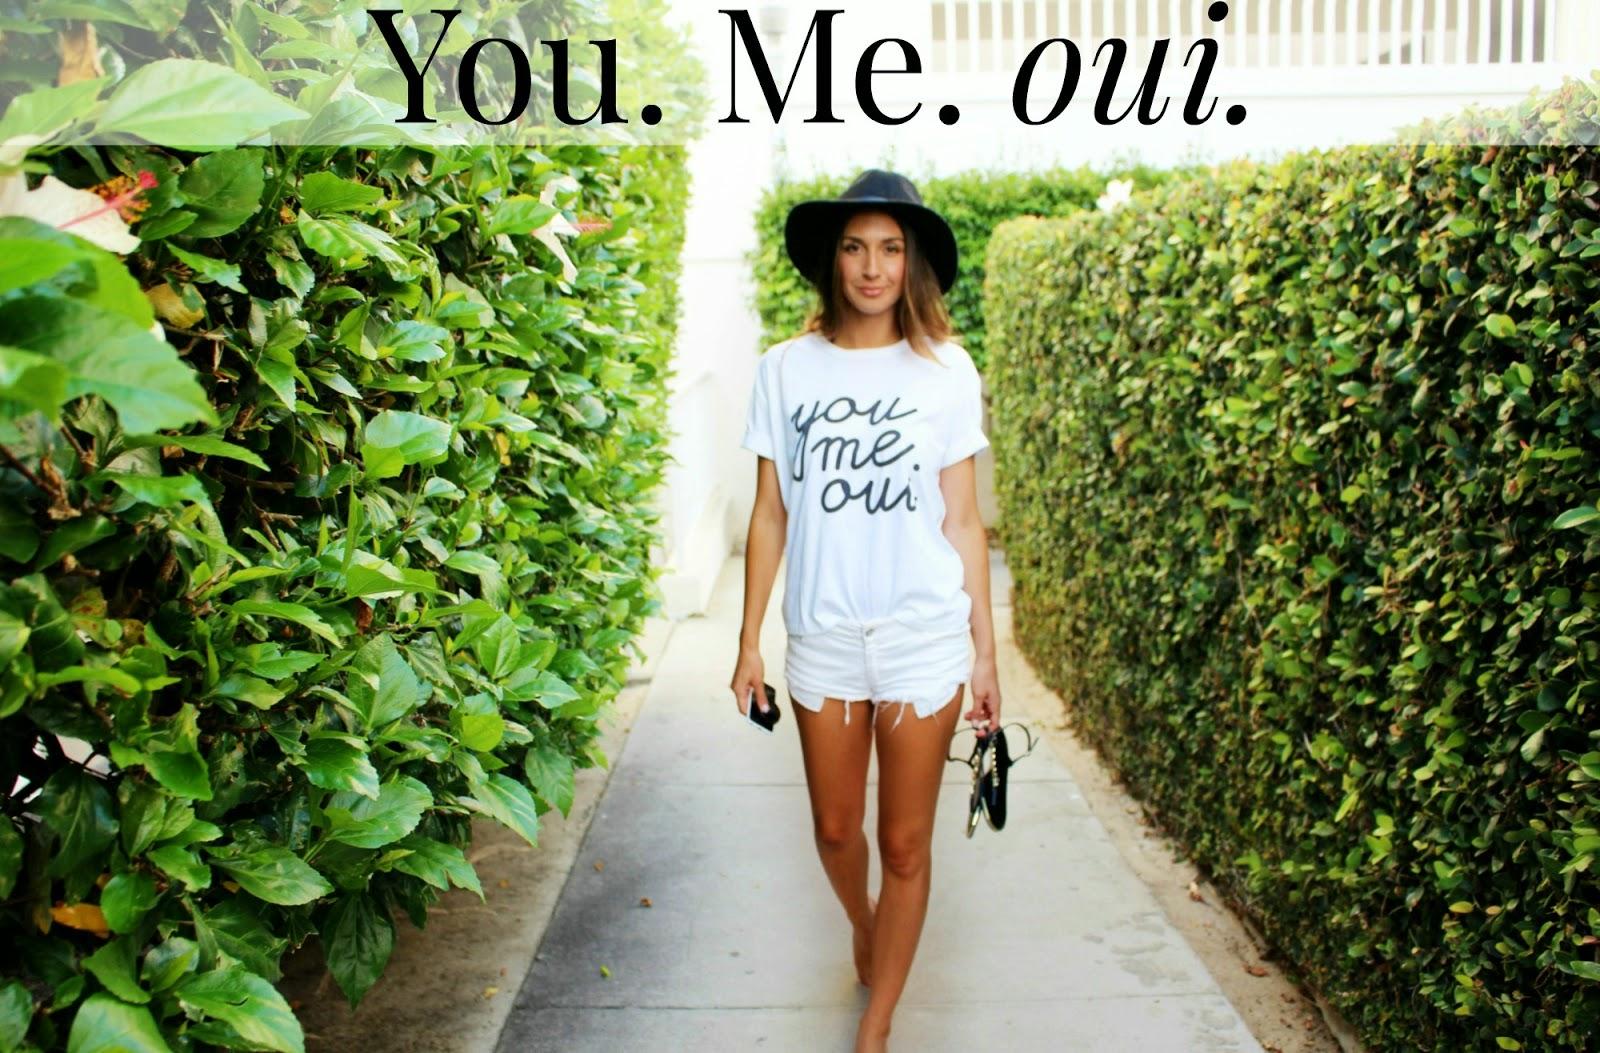 http://www.mepoopsie.com/2014/07/you-me-oui.html